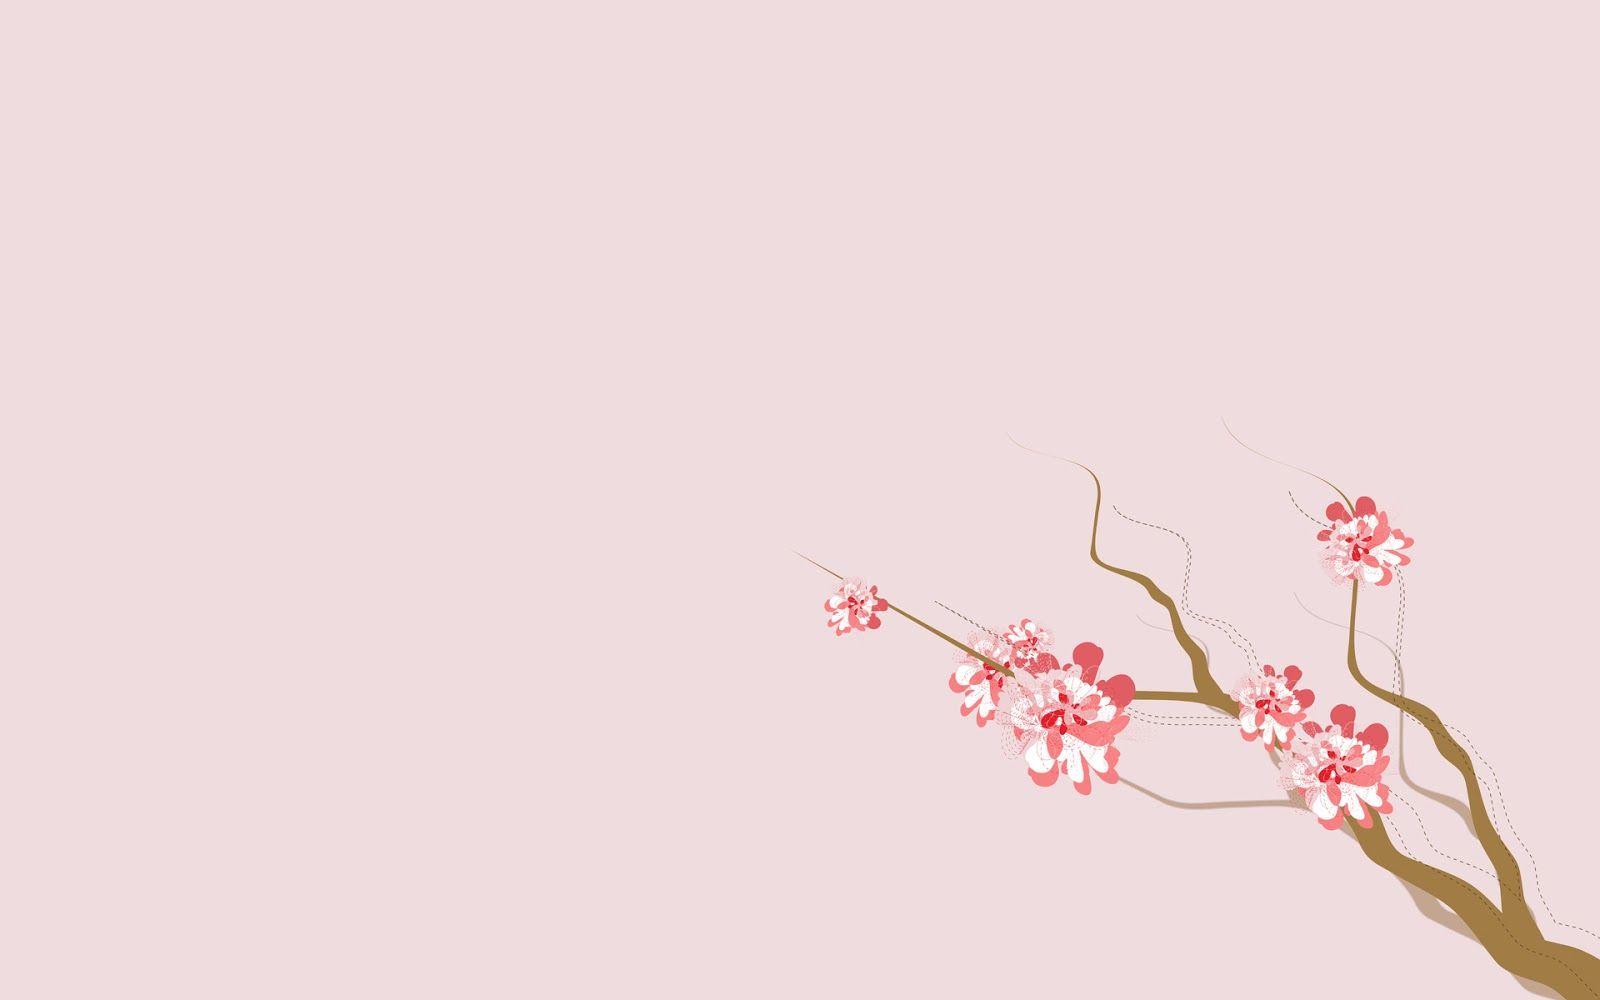 25 Trends For Background Power Point Bunga Sakura Summer Background